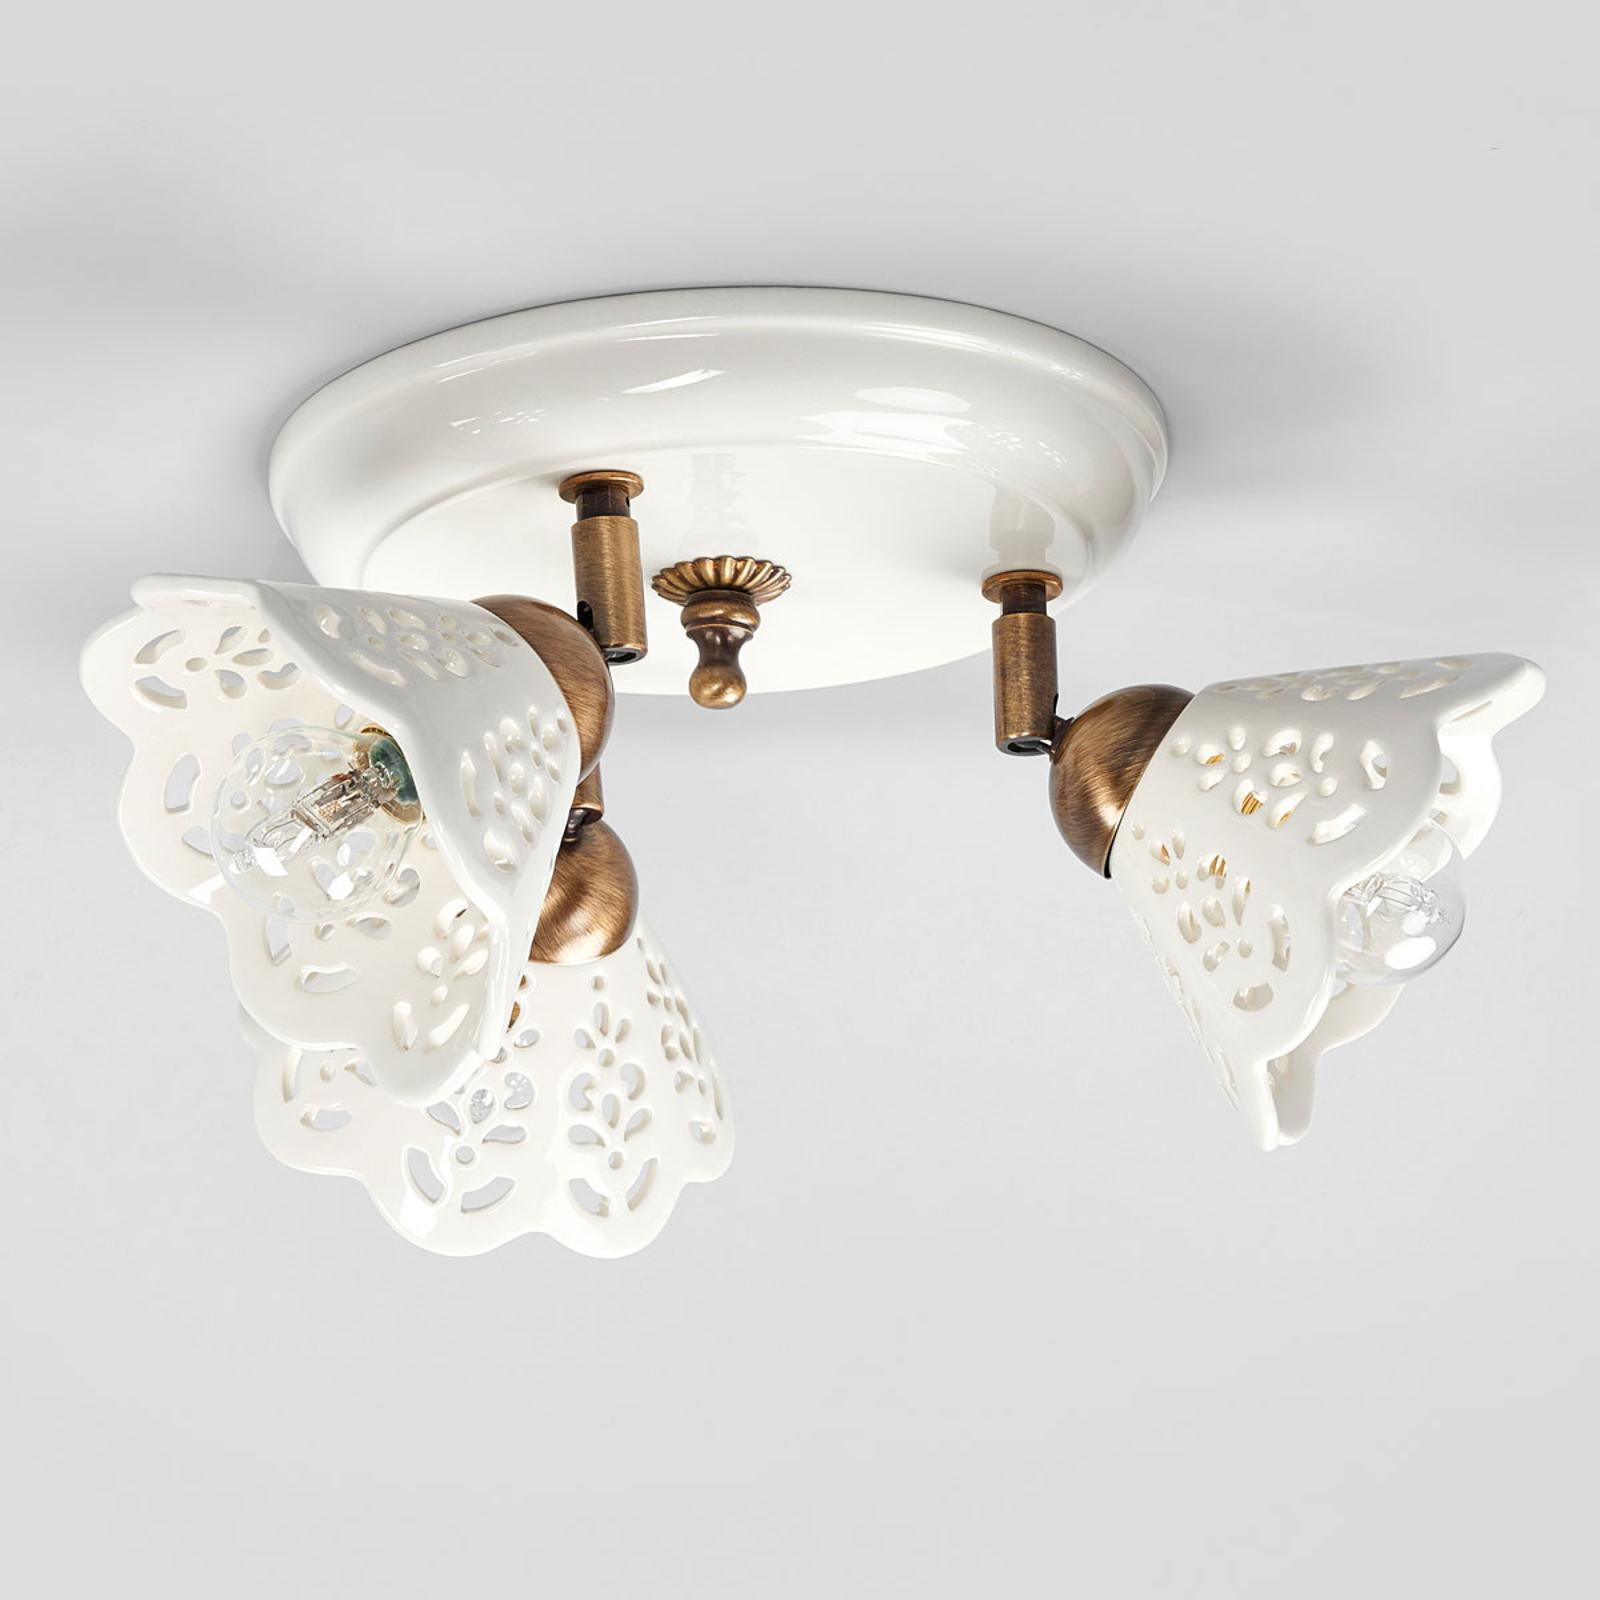 Betoverende plafondlamp PORTICO, 3-lichts